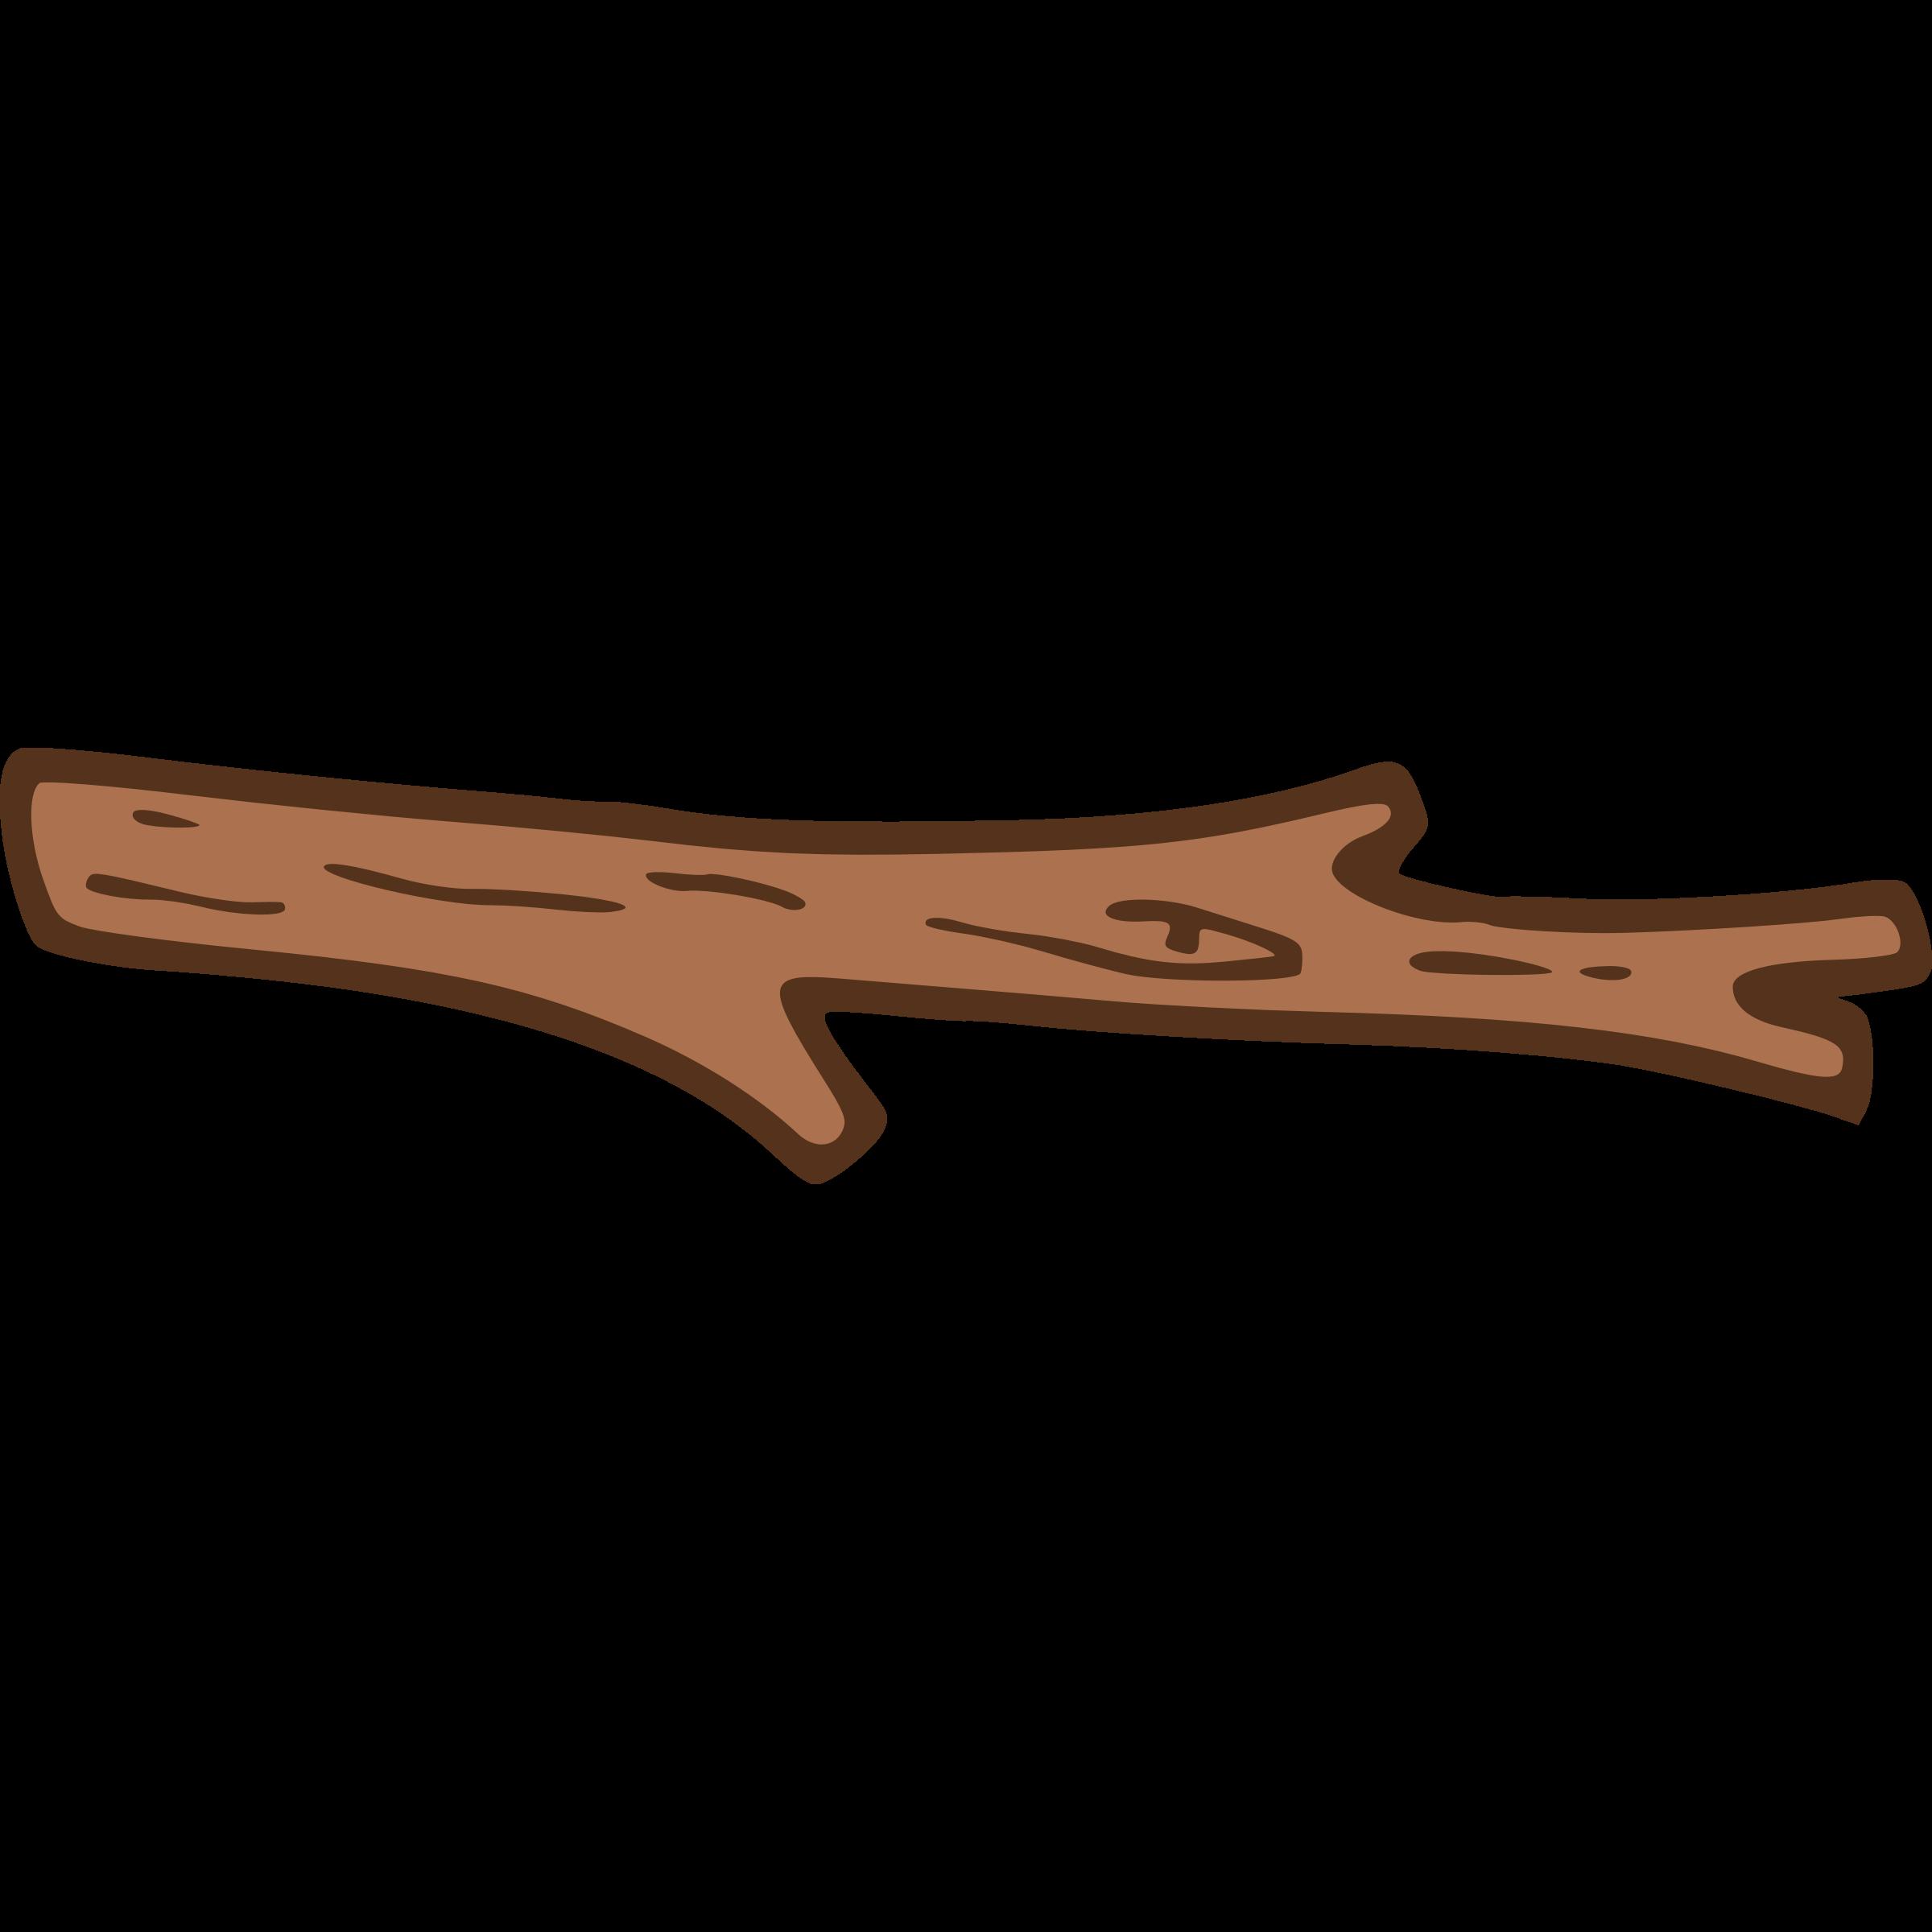 2400x2400 Stick Clip Art